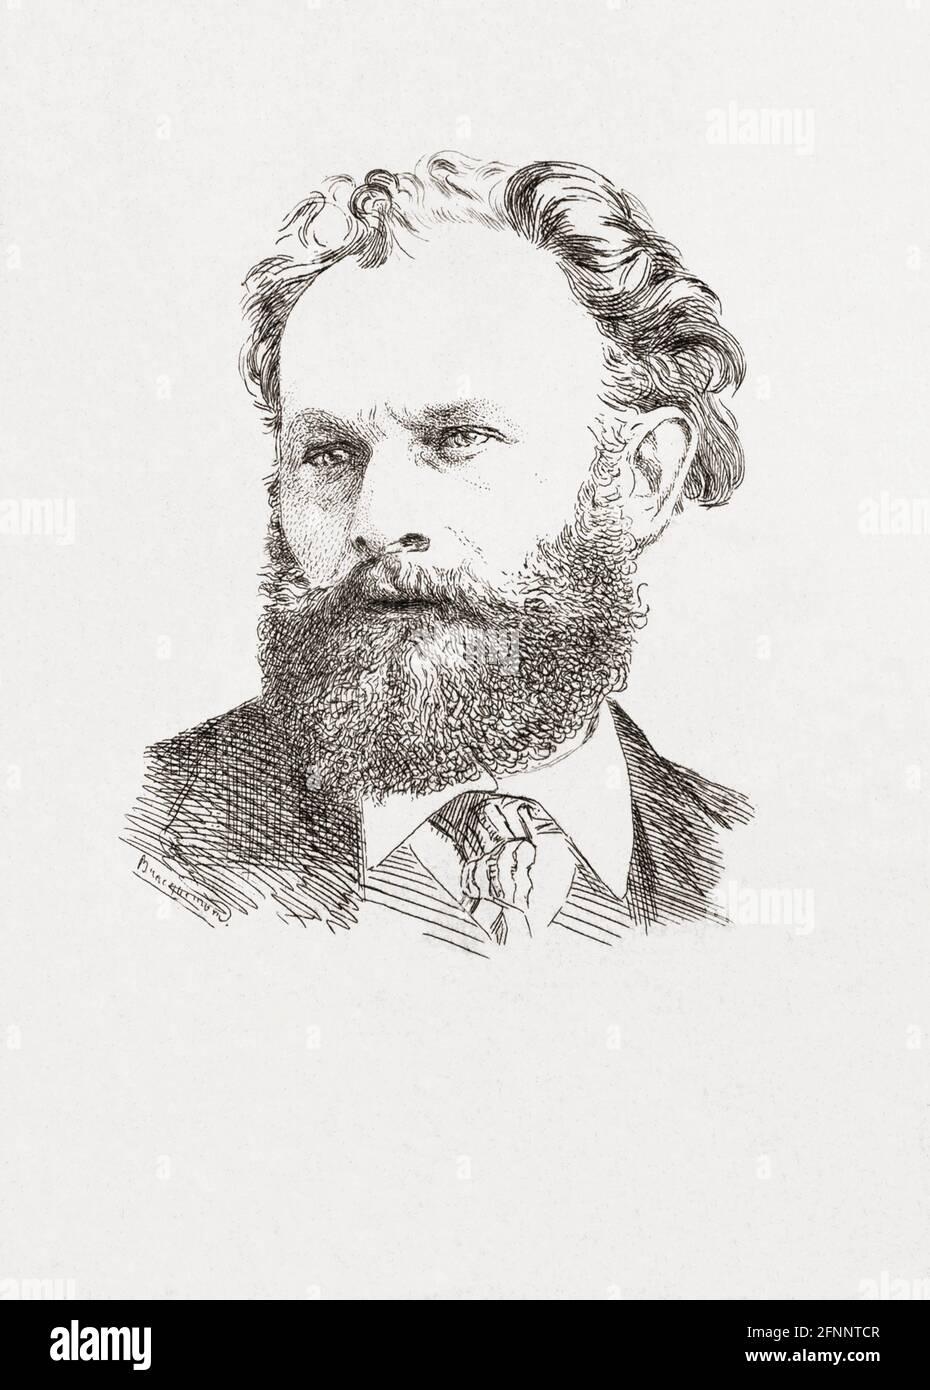 Édouard Manet, 1832 - 1883.  French artist.  After a work by Felix Bracquemond. Stock Photo